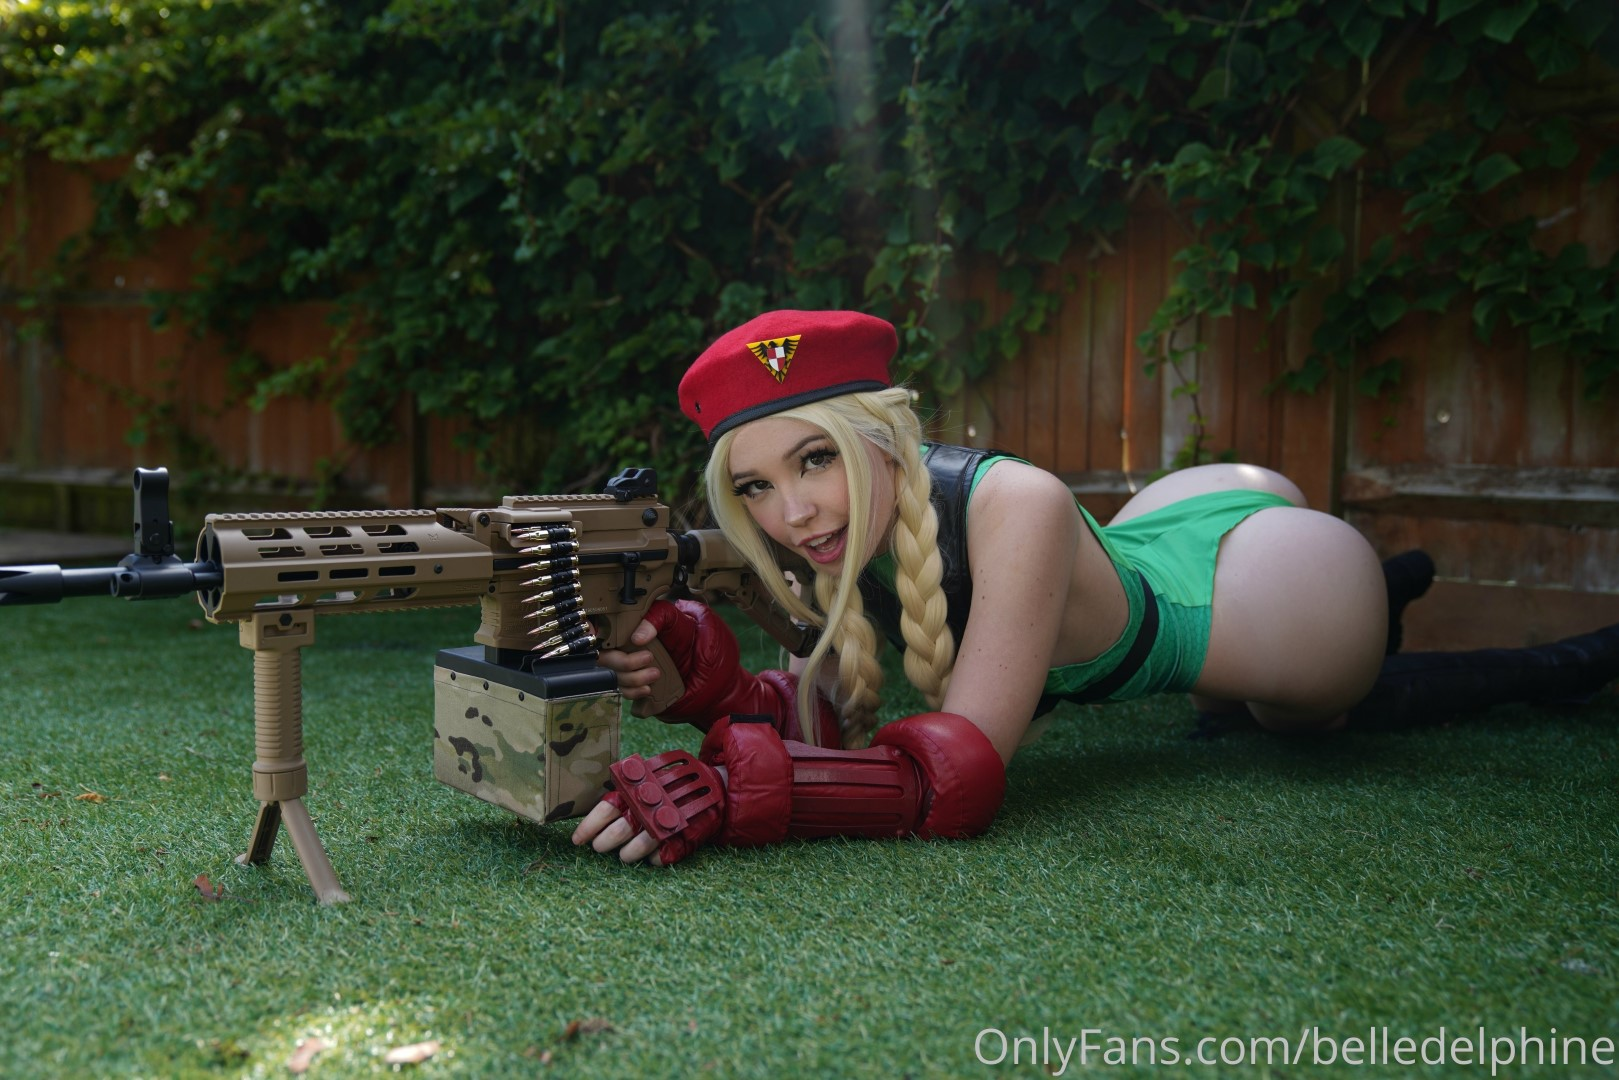 Belle Delphine Cammy Street Fighter Set 0197